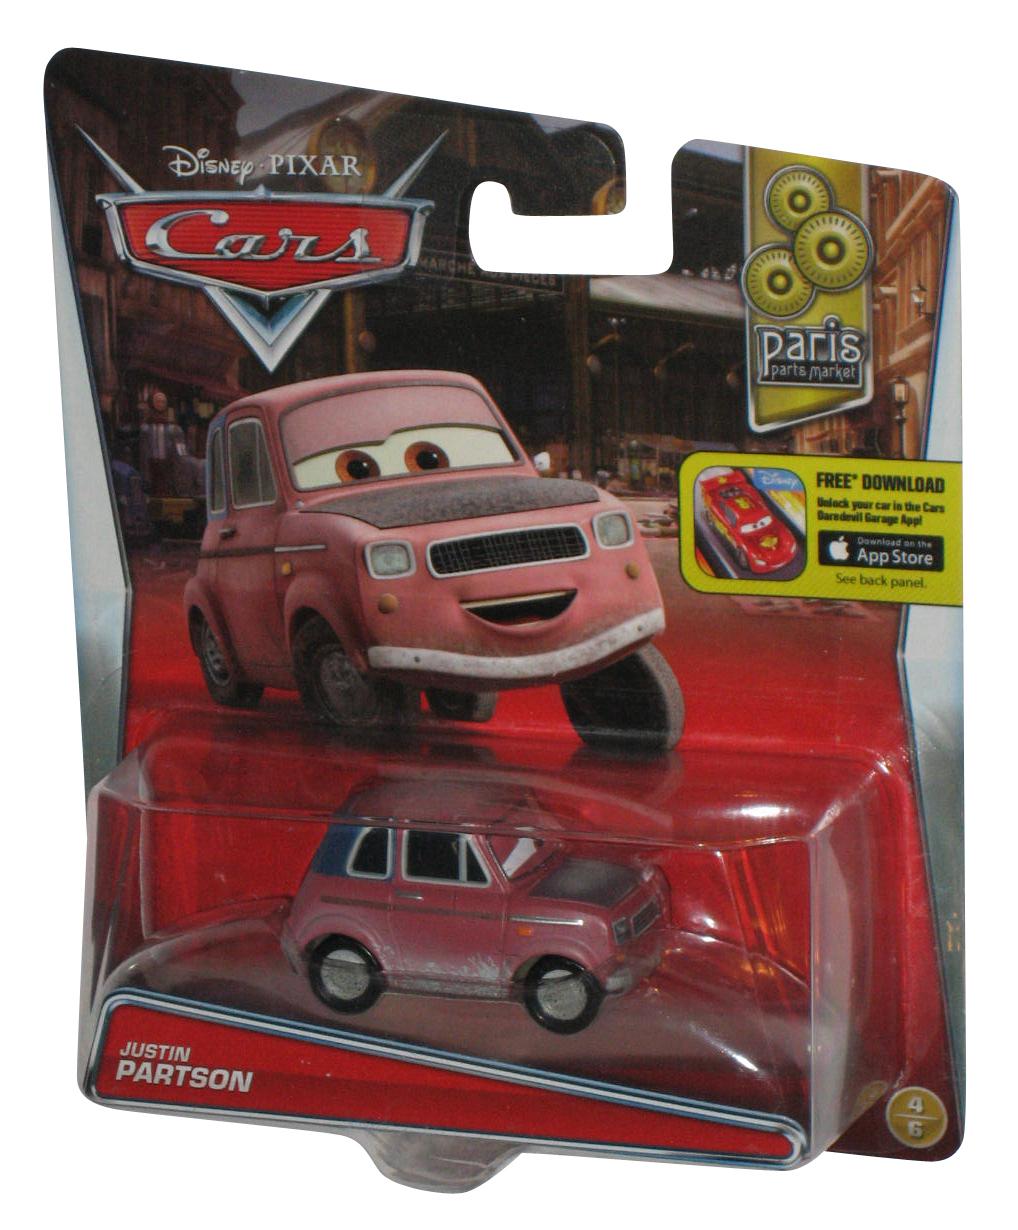 Disney Pixar Cars Movie Justin Partson Die Cast Toy Car Ebay